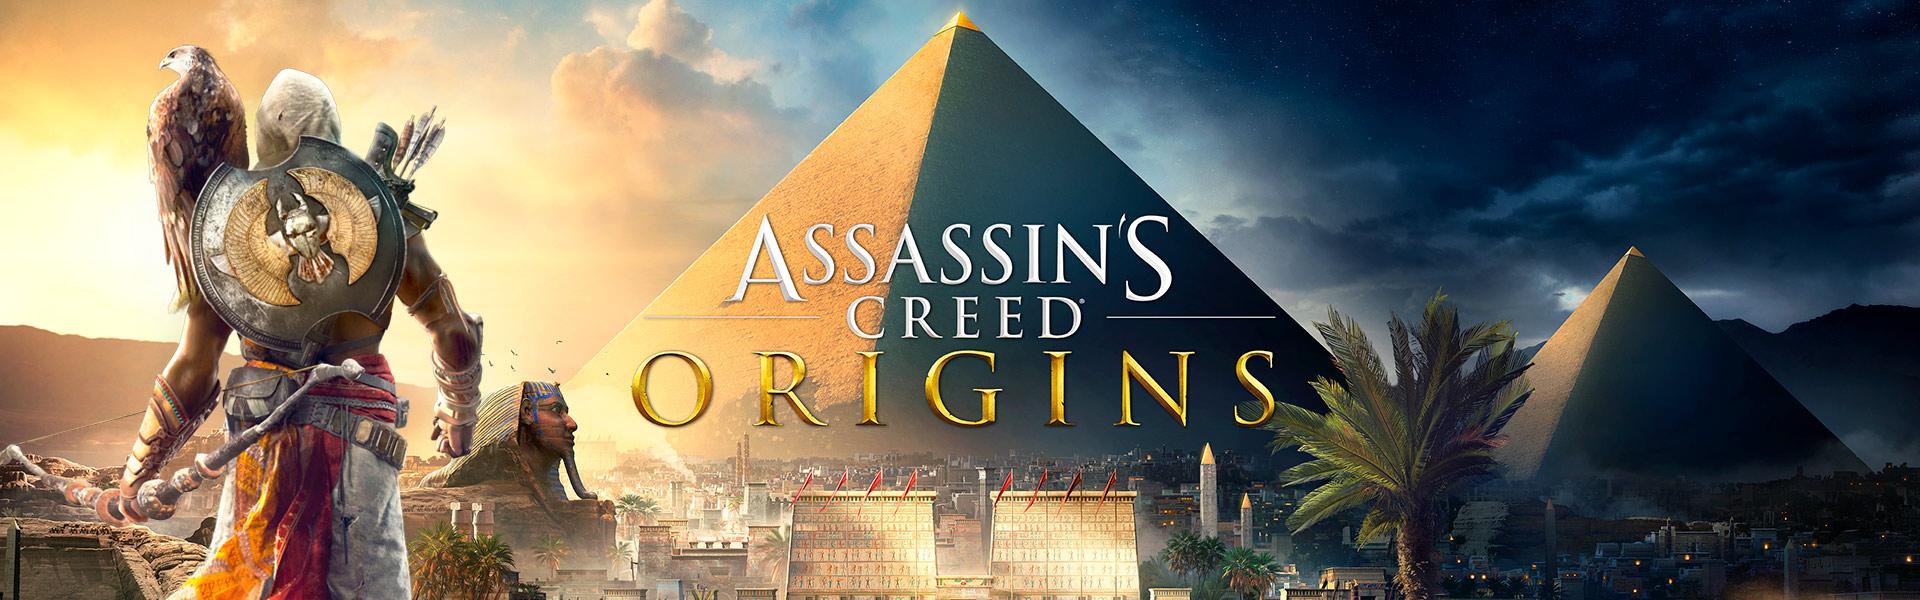 Assasins's Creed Origins - system walki